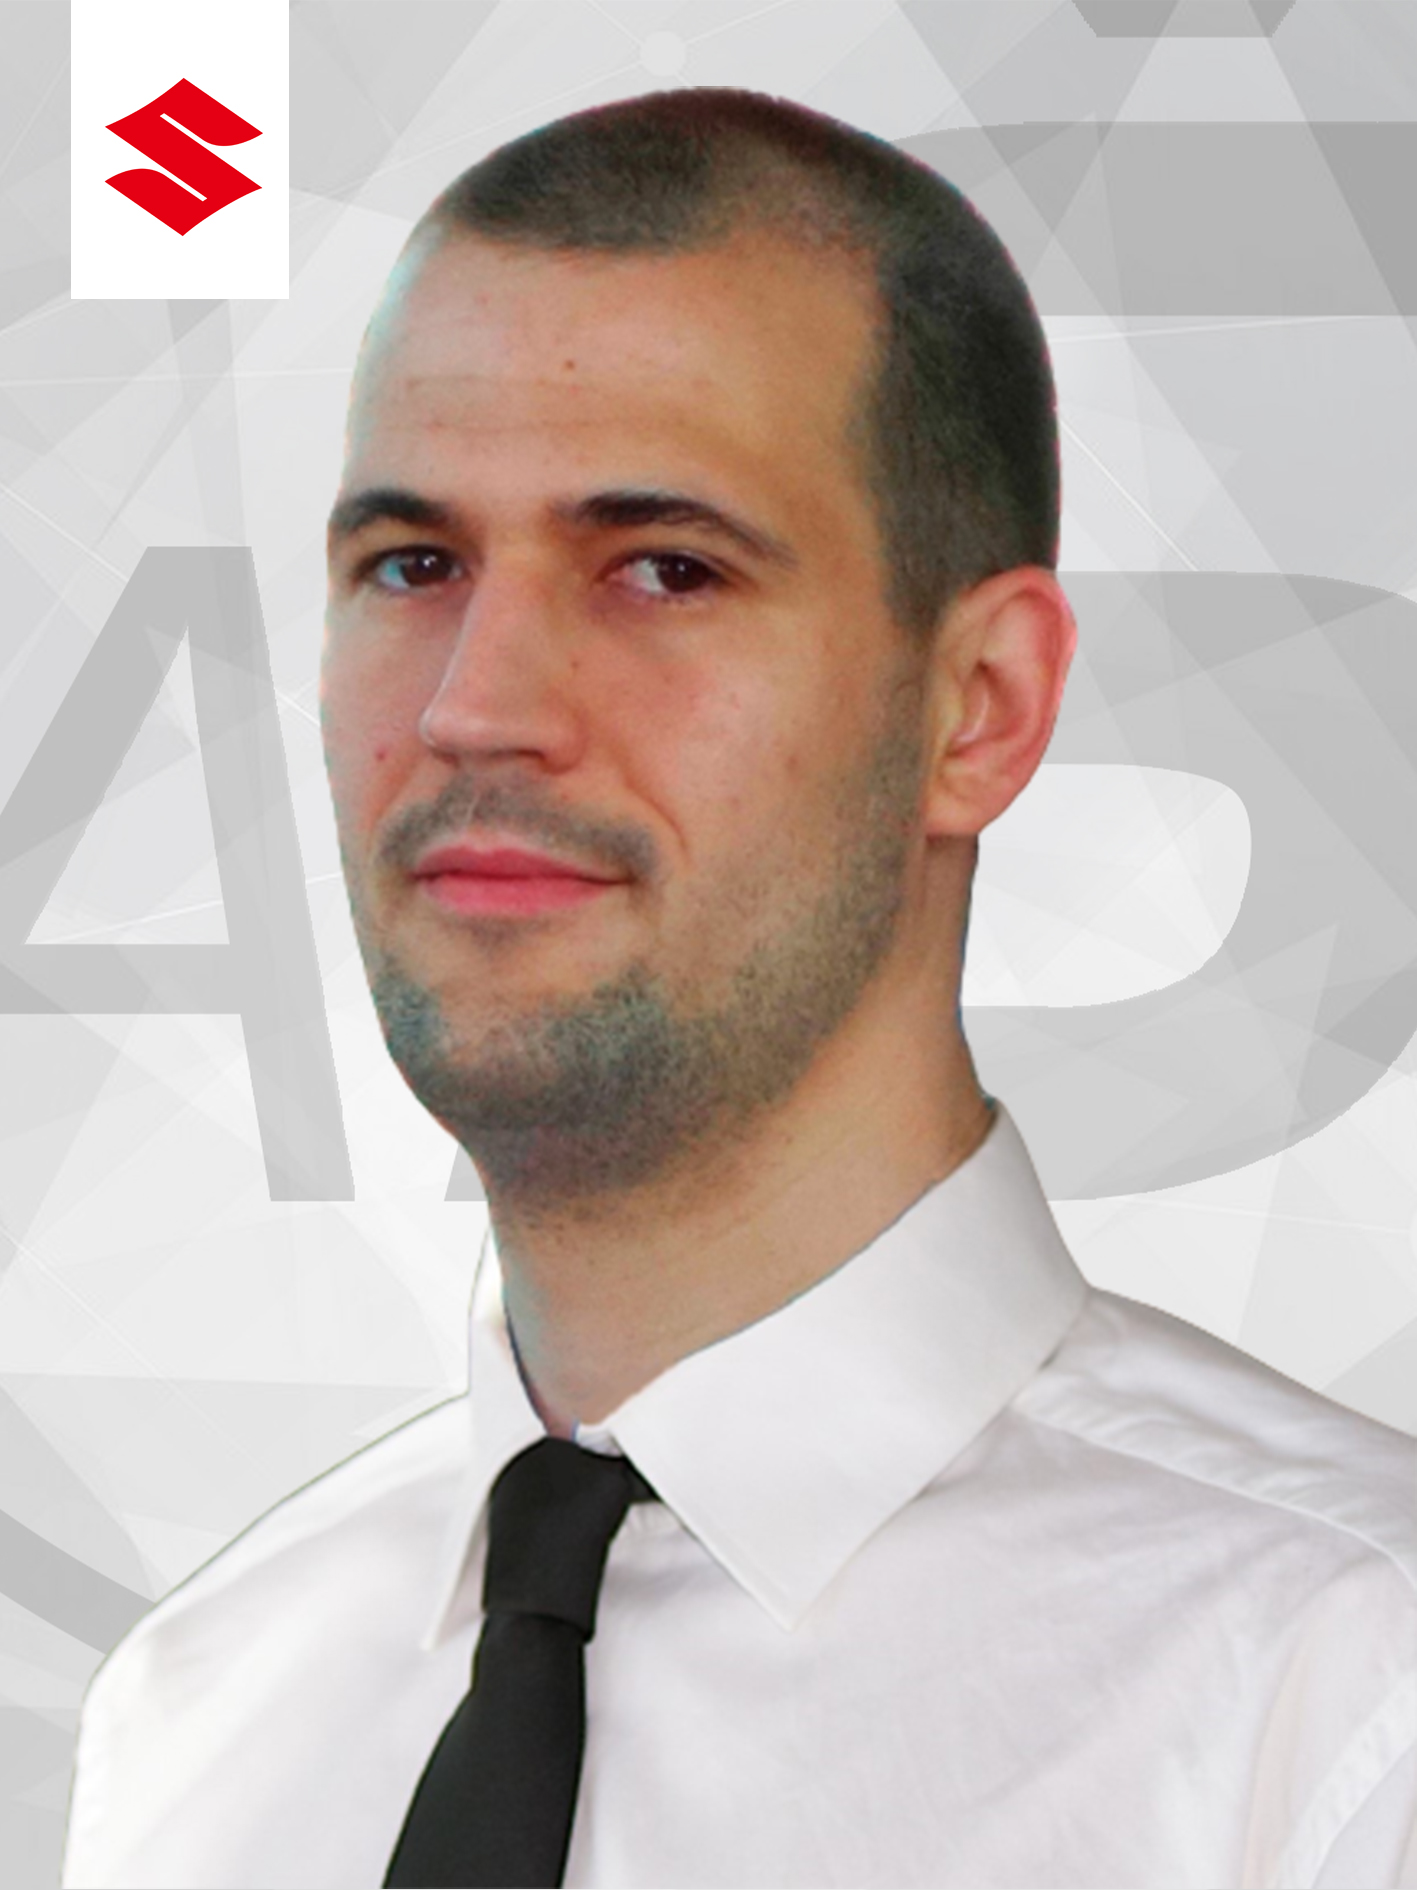 Marko Franjić